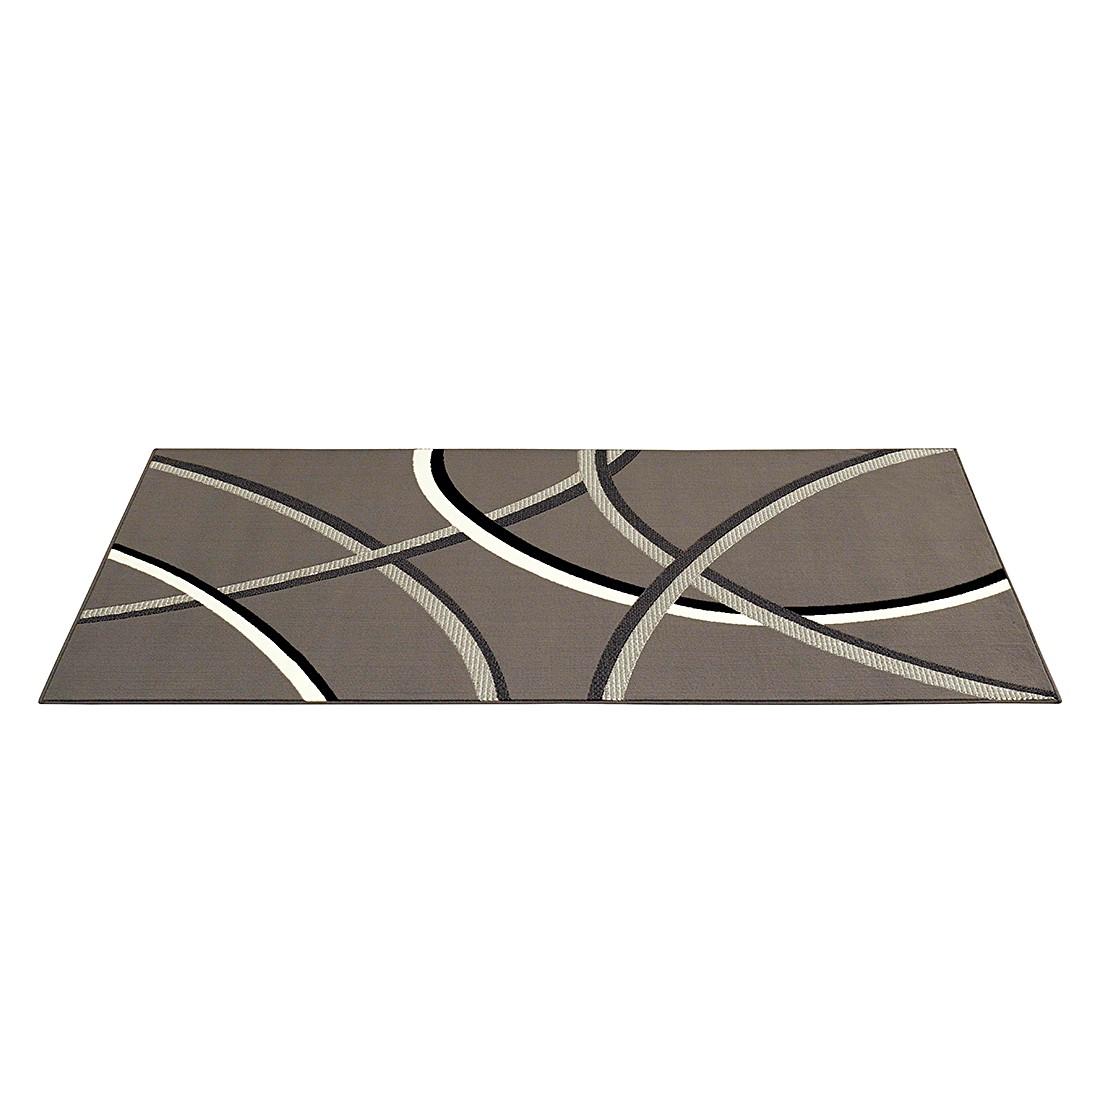 Teppich Lines – Grau – 80 x 150 cm, Hanse Home Collection bestellen